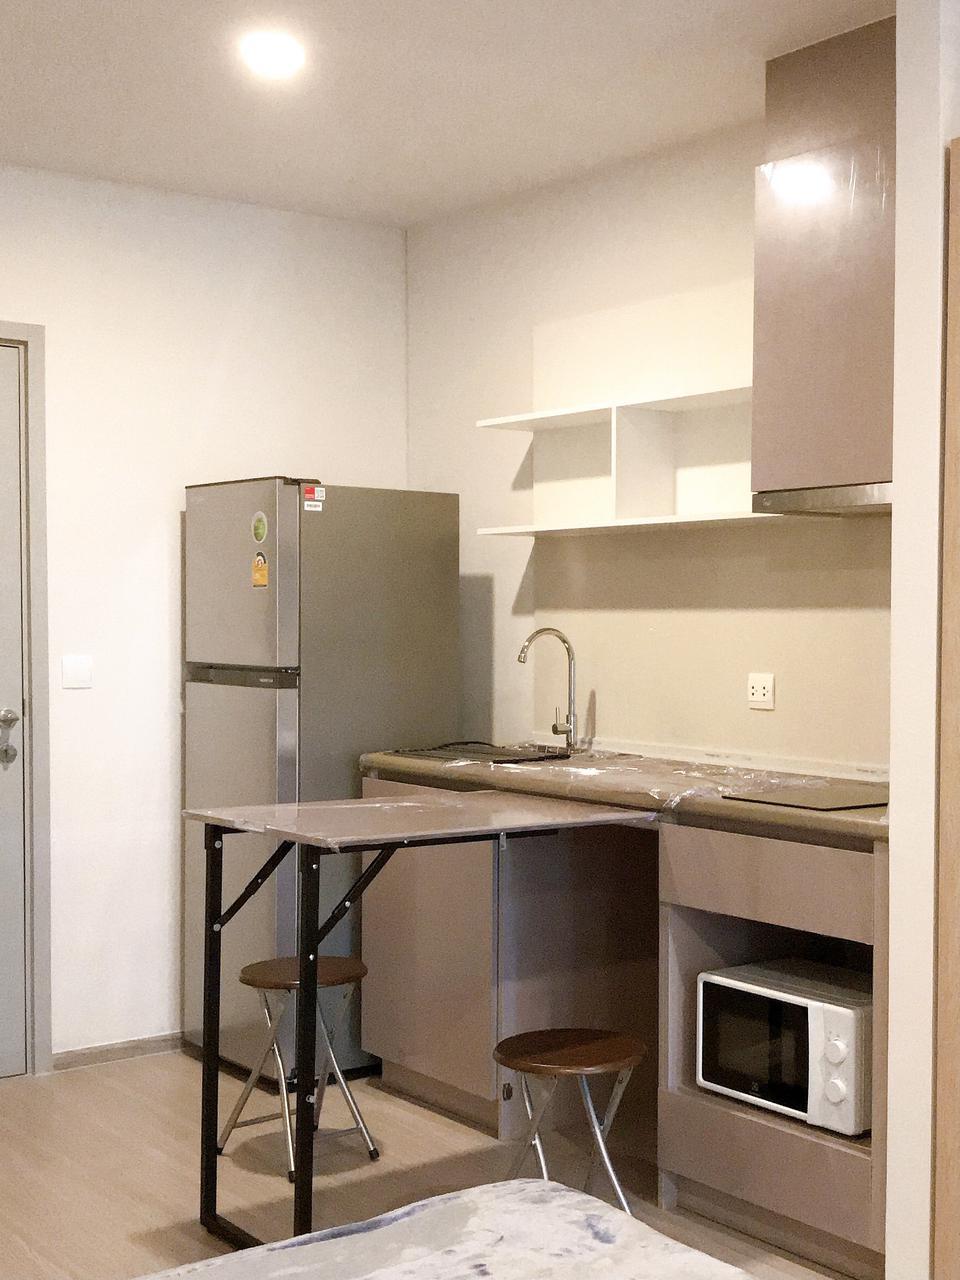 Fully furnished For rent ให้เช่า ฿12,000 ห้อง 25 ตร.ม. 8F ใหม่พร้อมอยู่ Aspire อโศก-รัชดา **รับ Agent รูปที่ 2